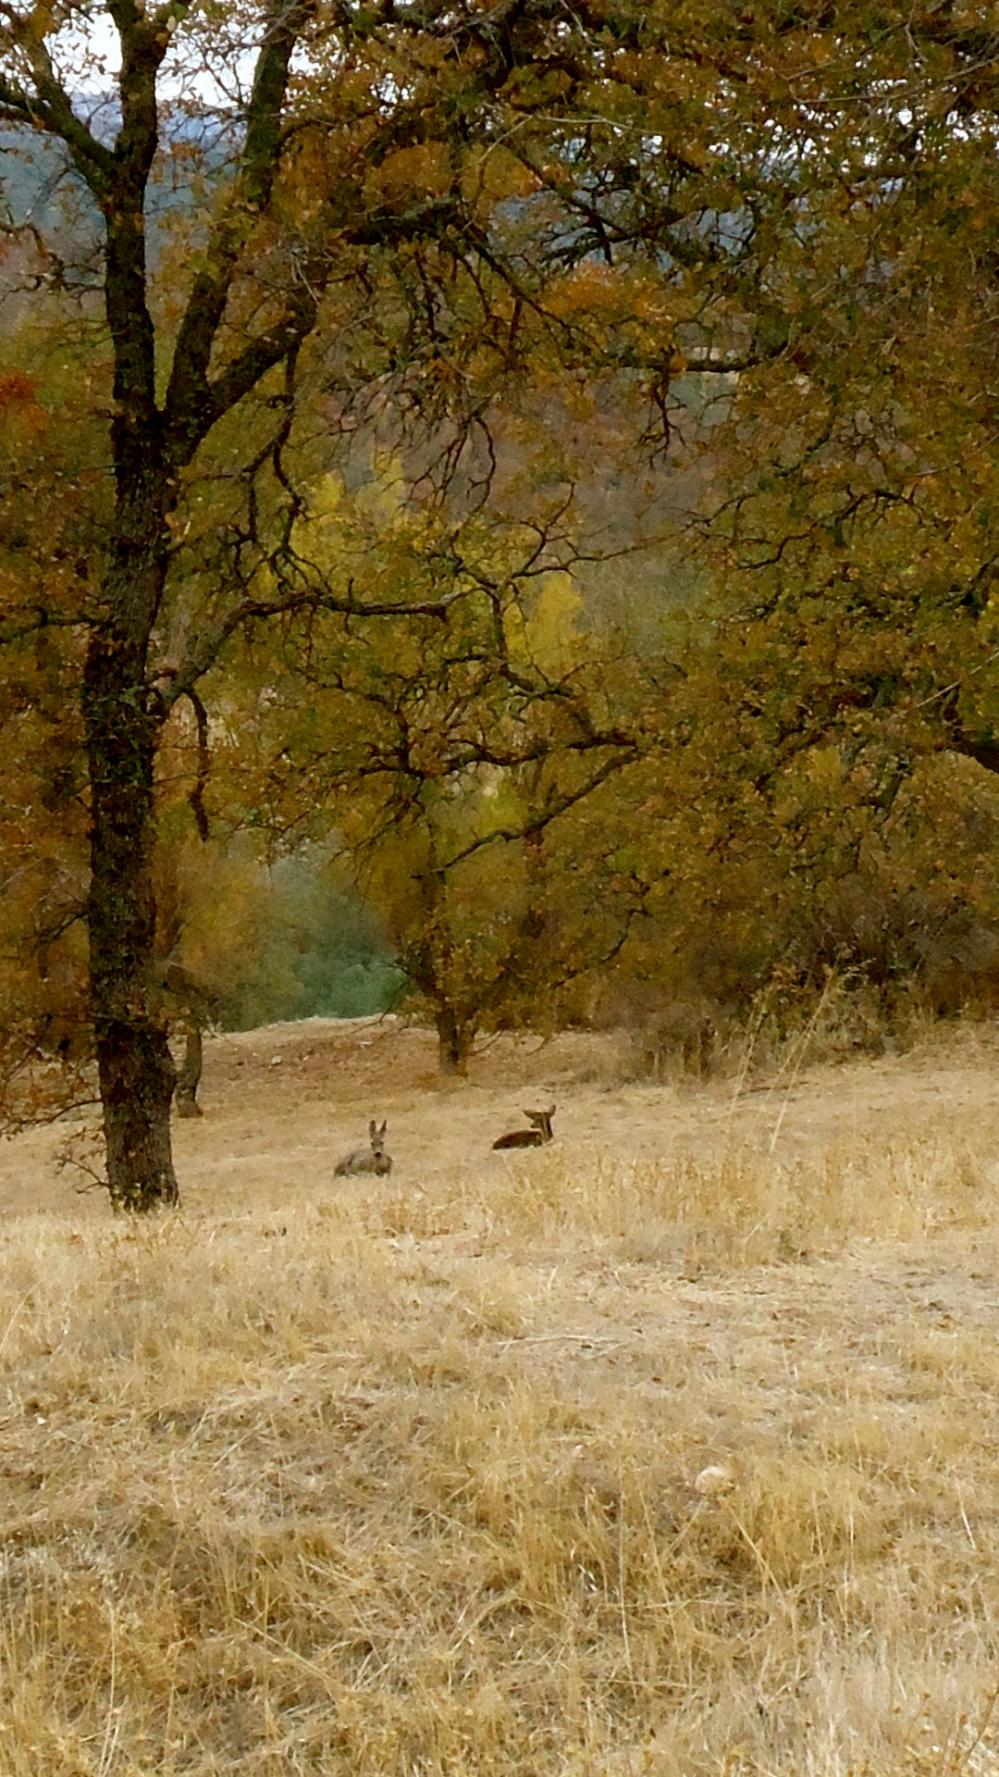 Deer In The Fall Foliage